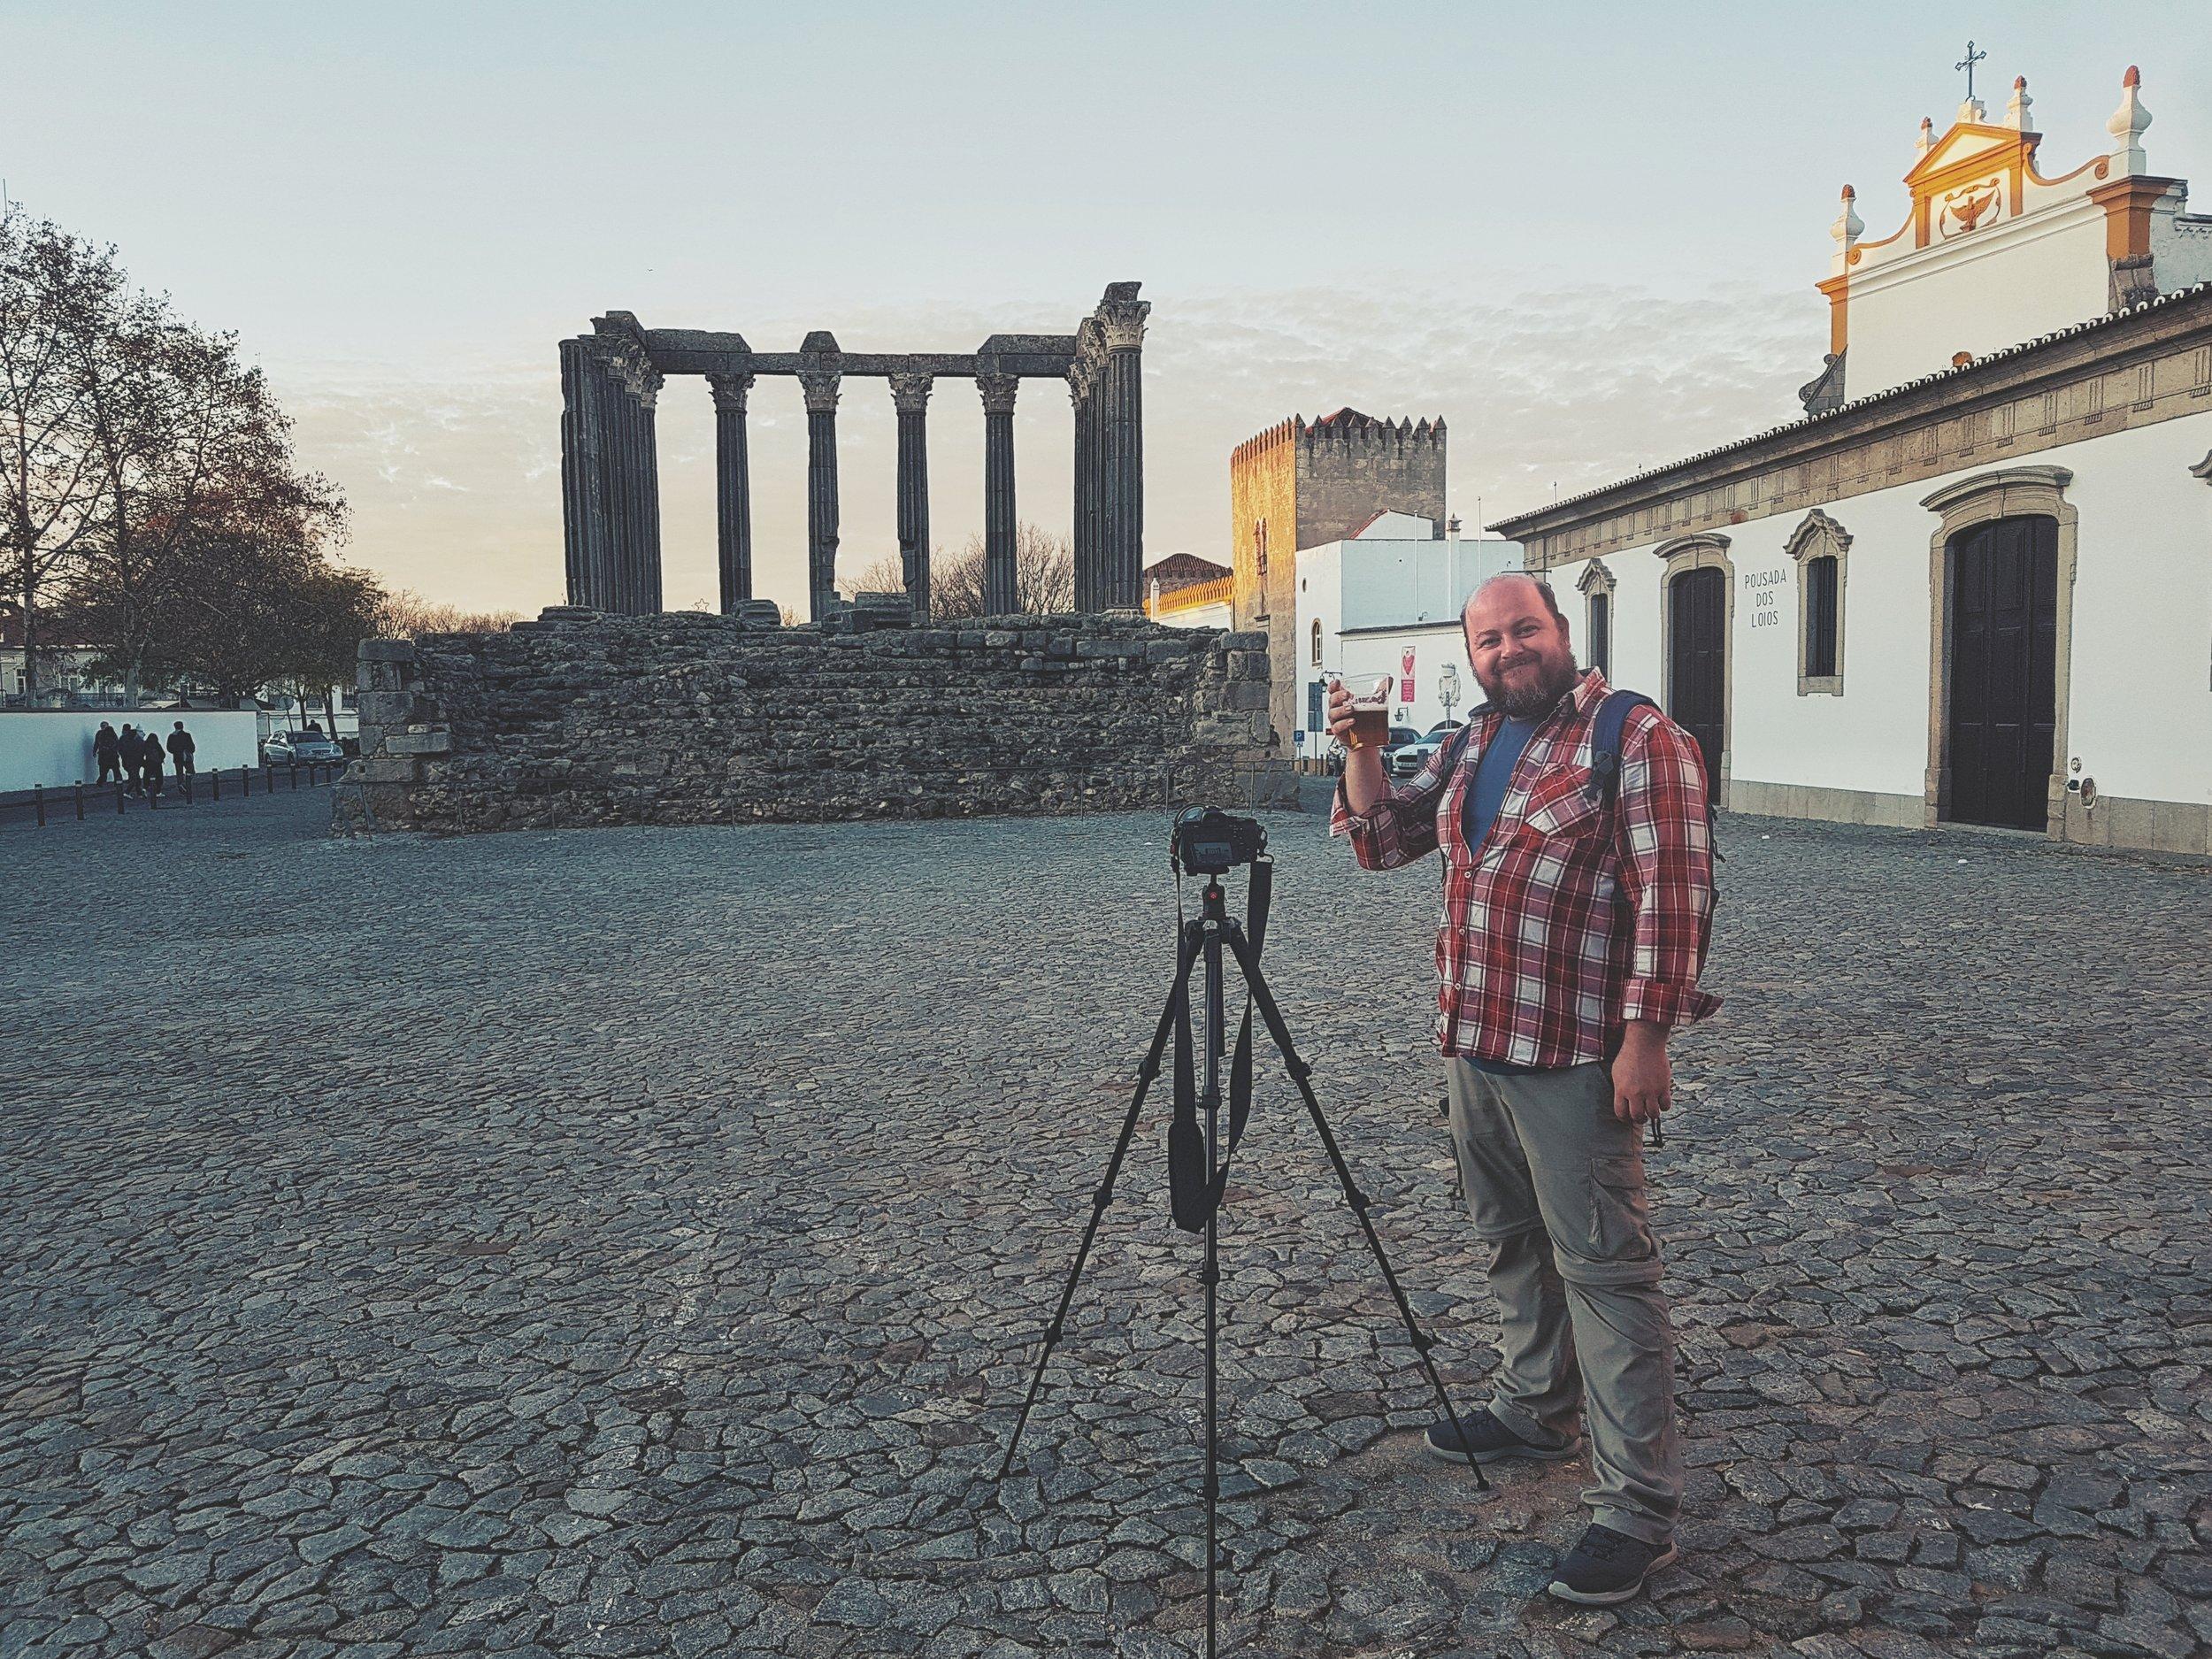 Evora. Roman Ruins. Portugal. Alentejo. Piliers. Roman city. ancient roman town. Blue sky. travel. adventure. history. historical. wine. architecture..jpg